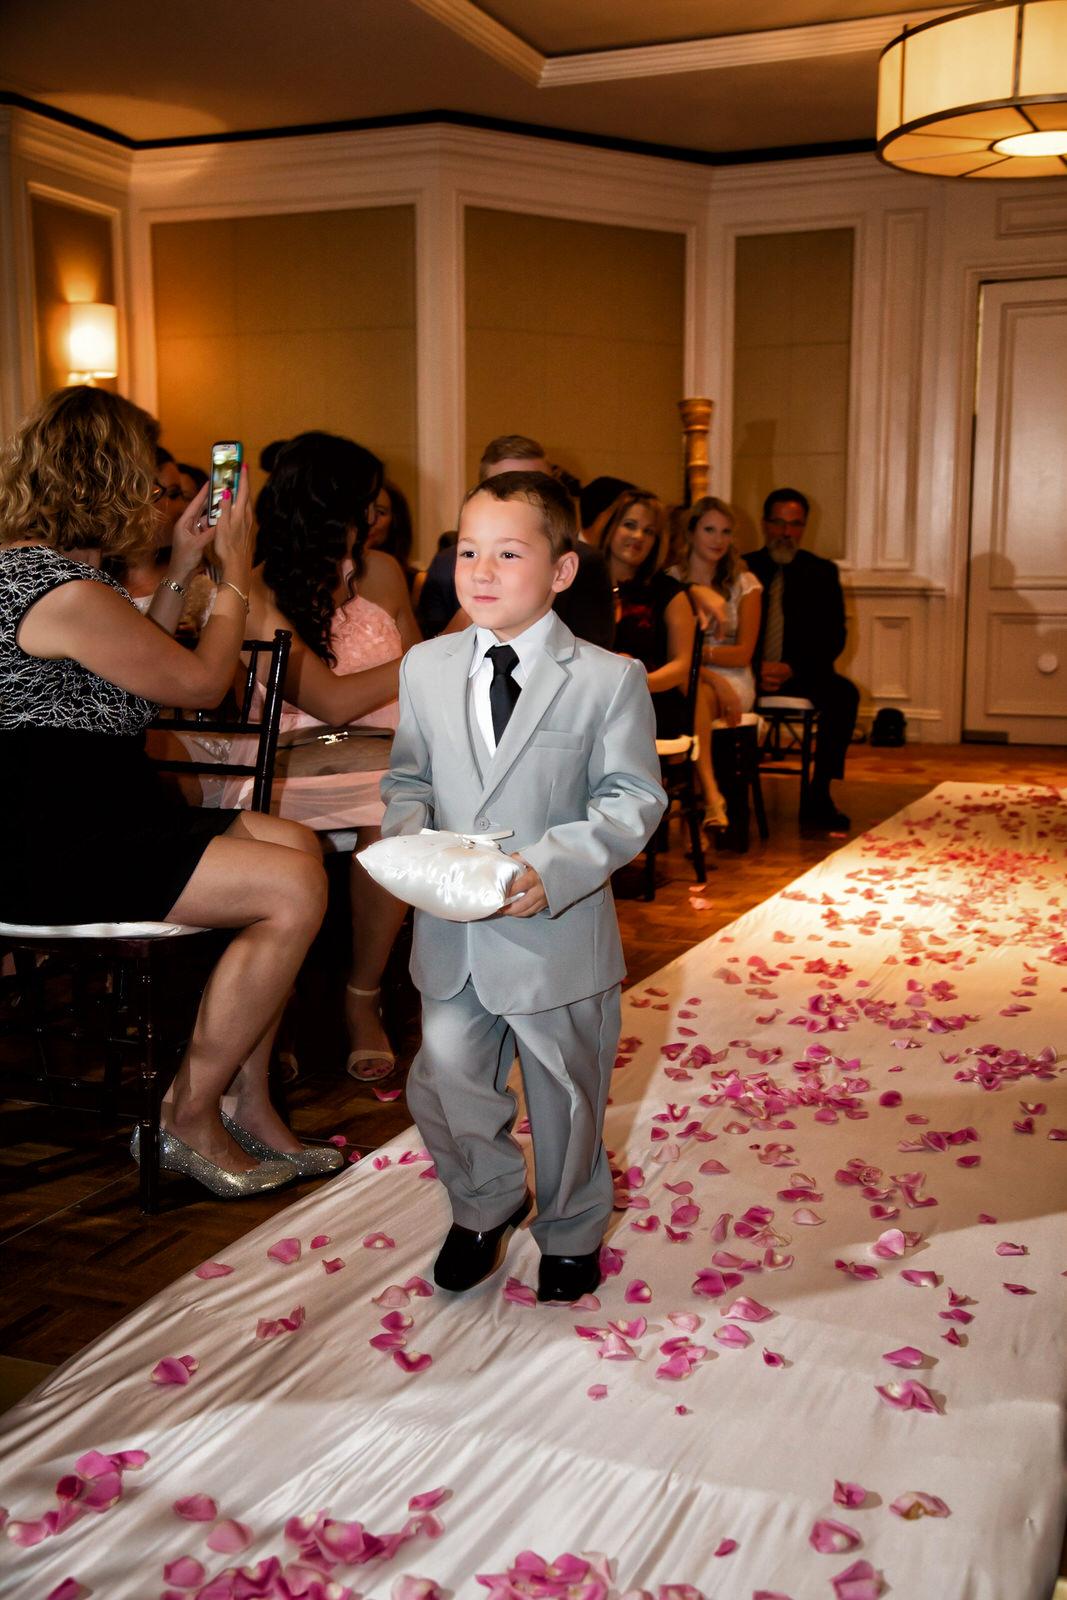 A Young Gentleman